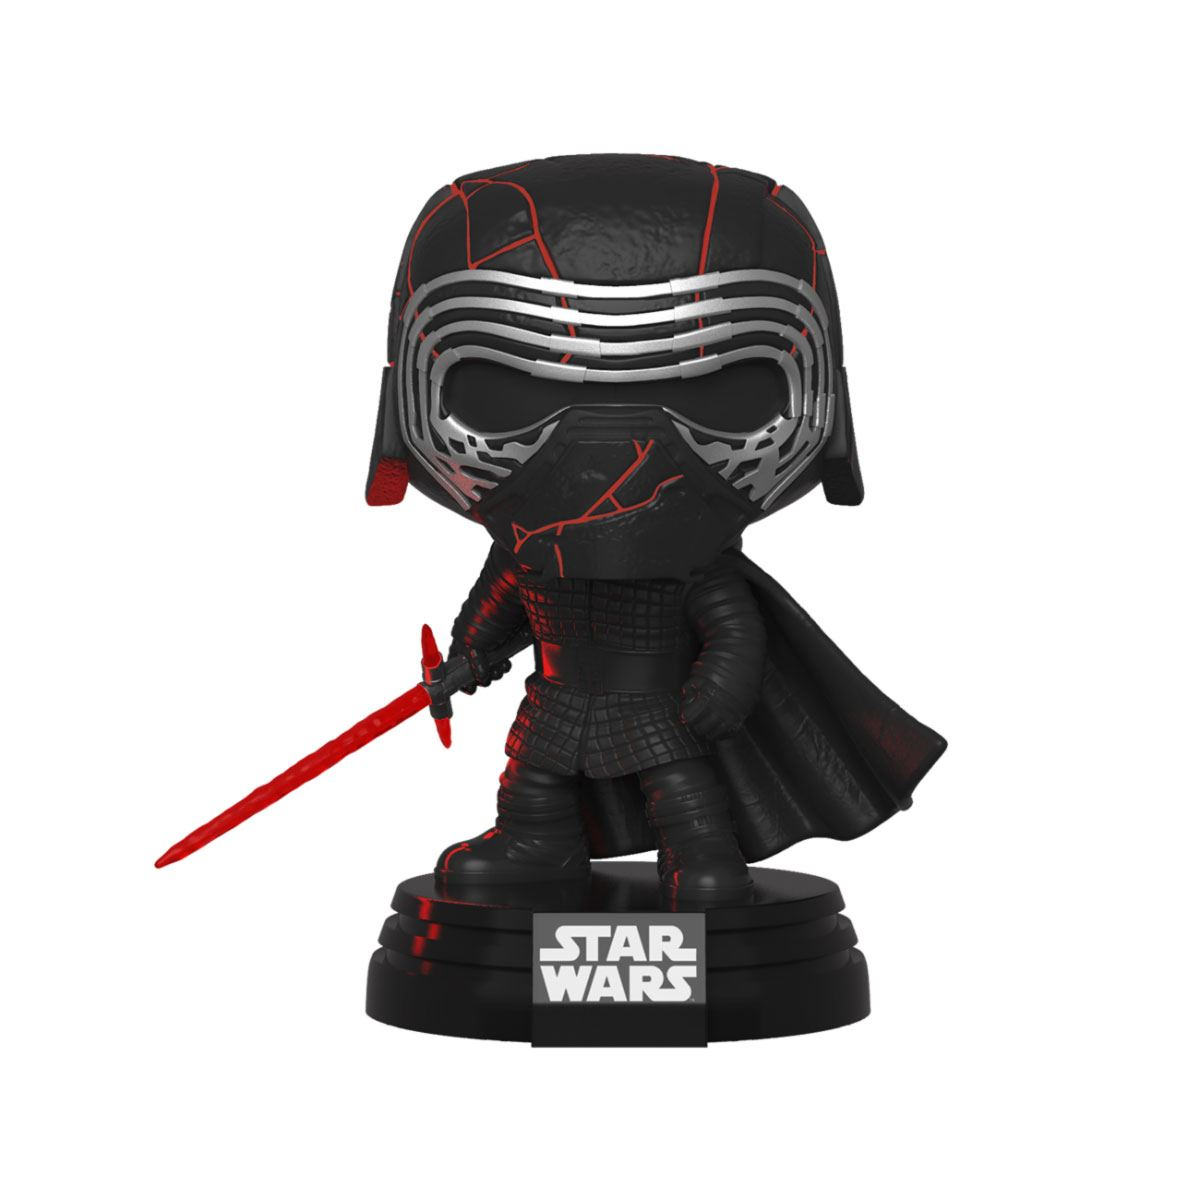 Star Wars Episode IX Electronic POP! Movies Vinyl Figure with Sound & Light Up Kylo Ren 9 cm